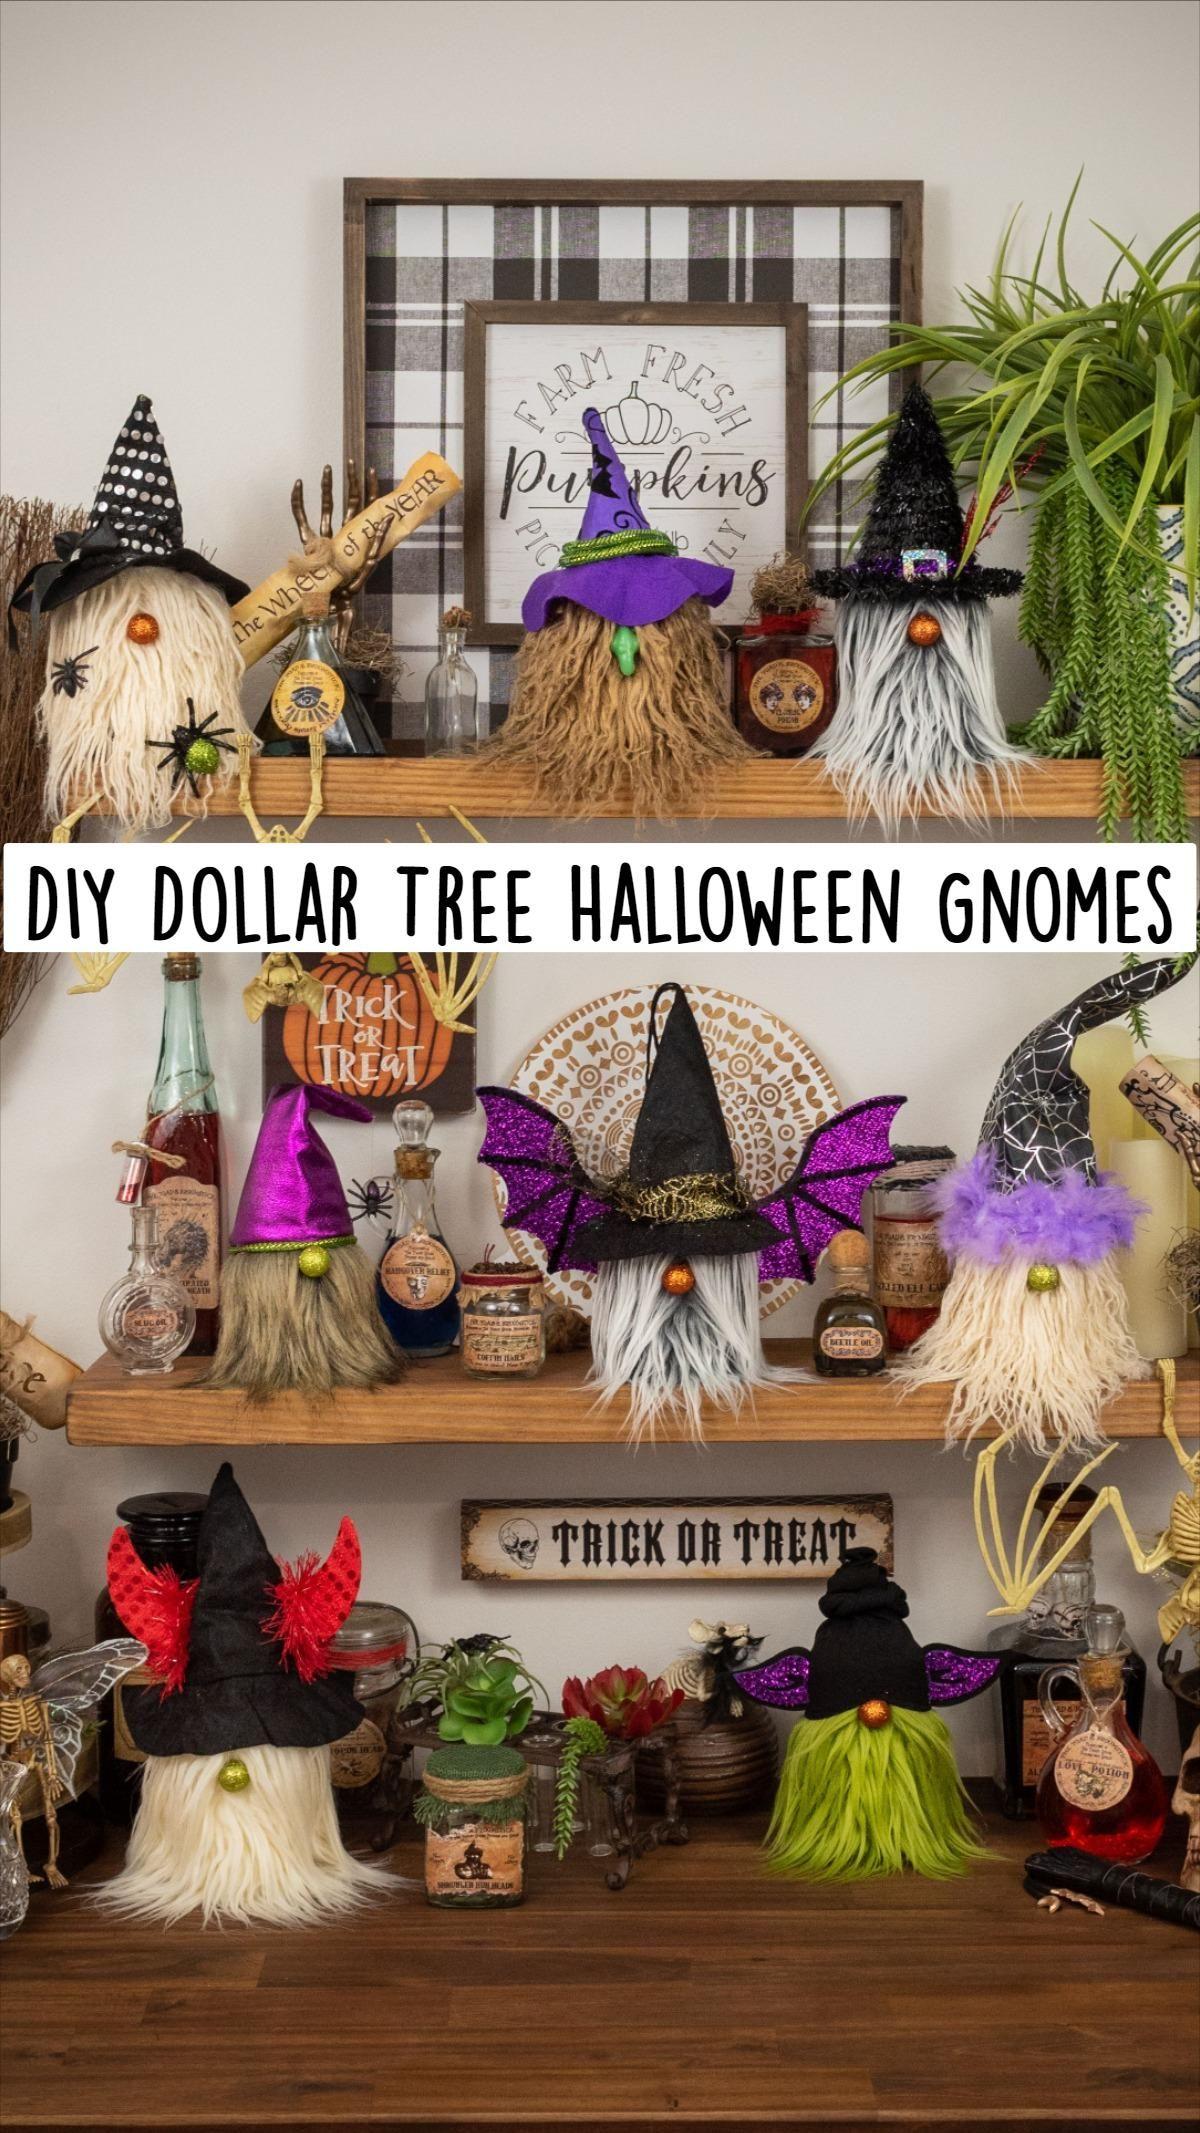 DIY Dollar Tree Halloween Gnomes